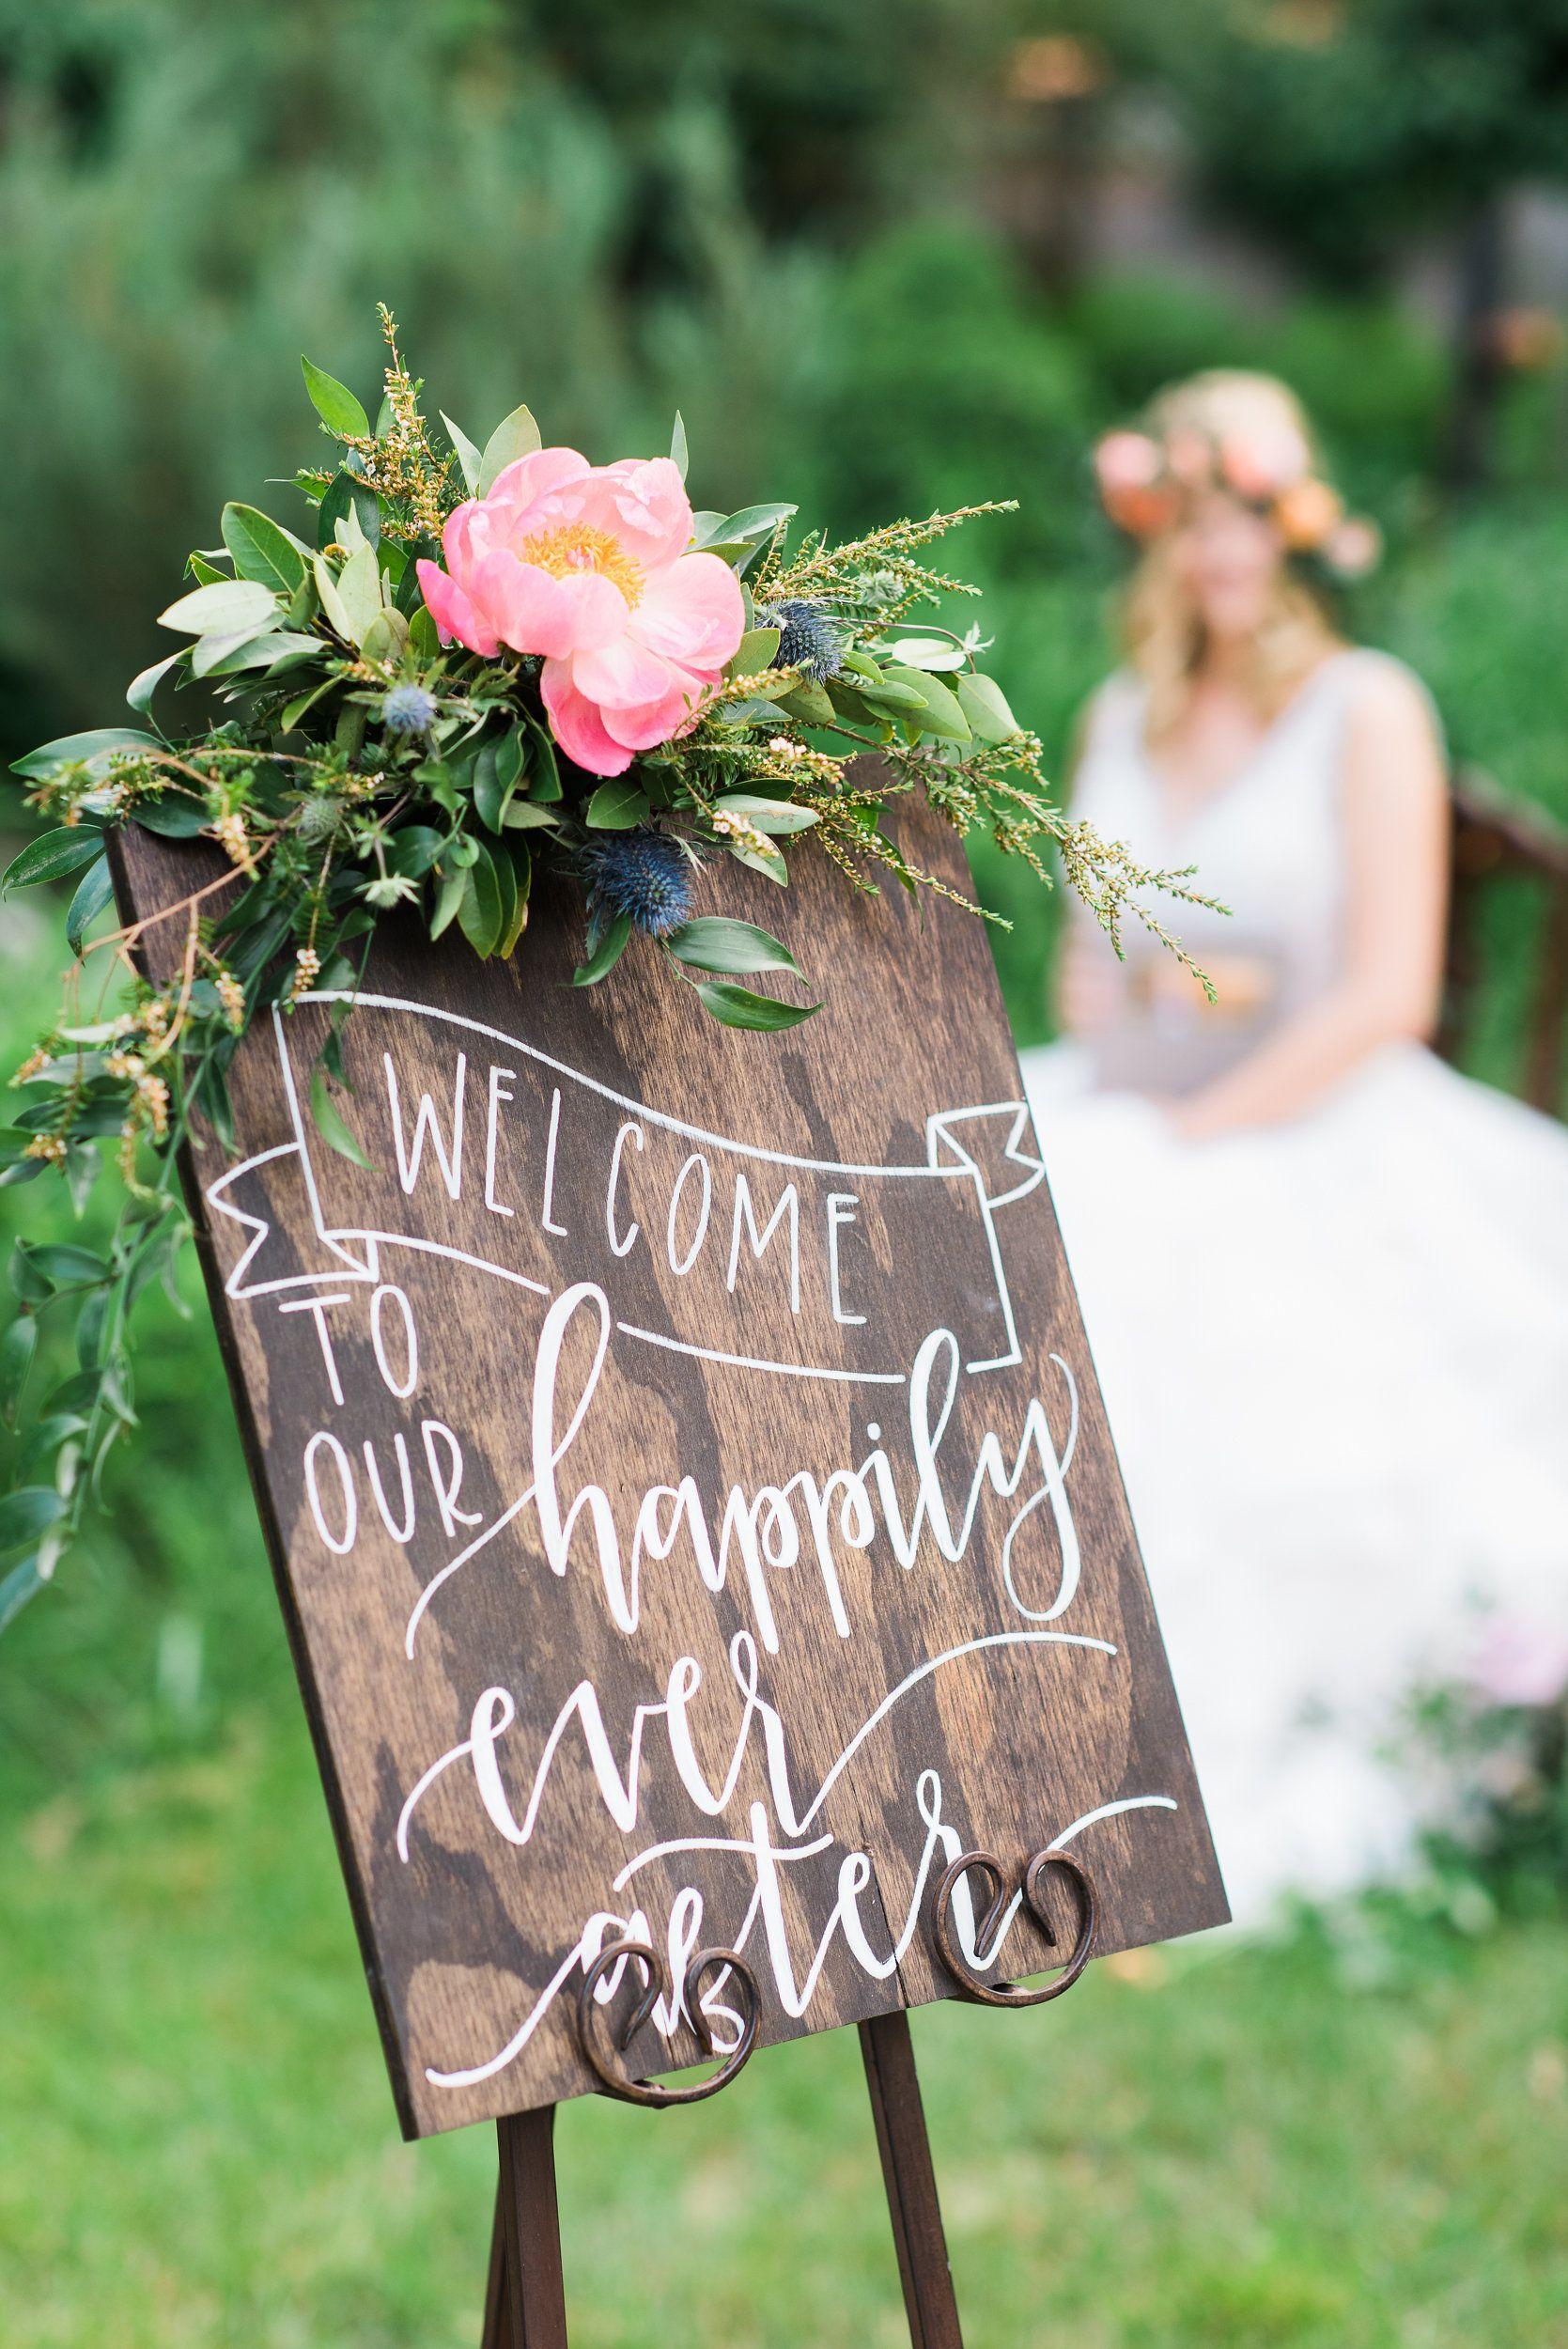 Uncategorized outdoor vintage glam wedding rustic wedding chic - Pink And Peach Vintage Garden Wedding